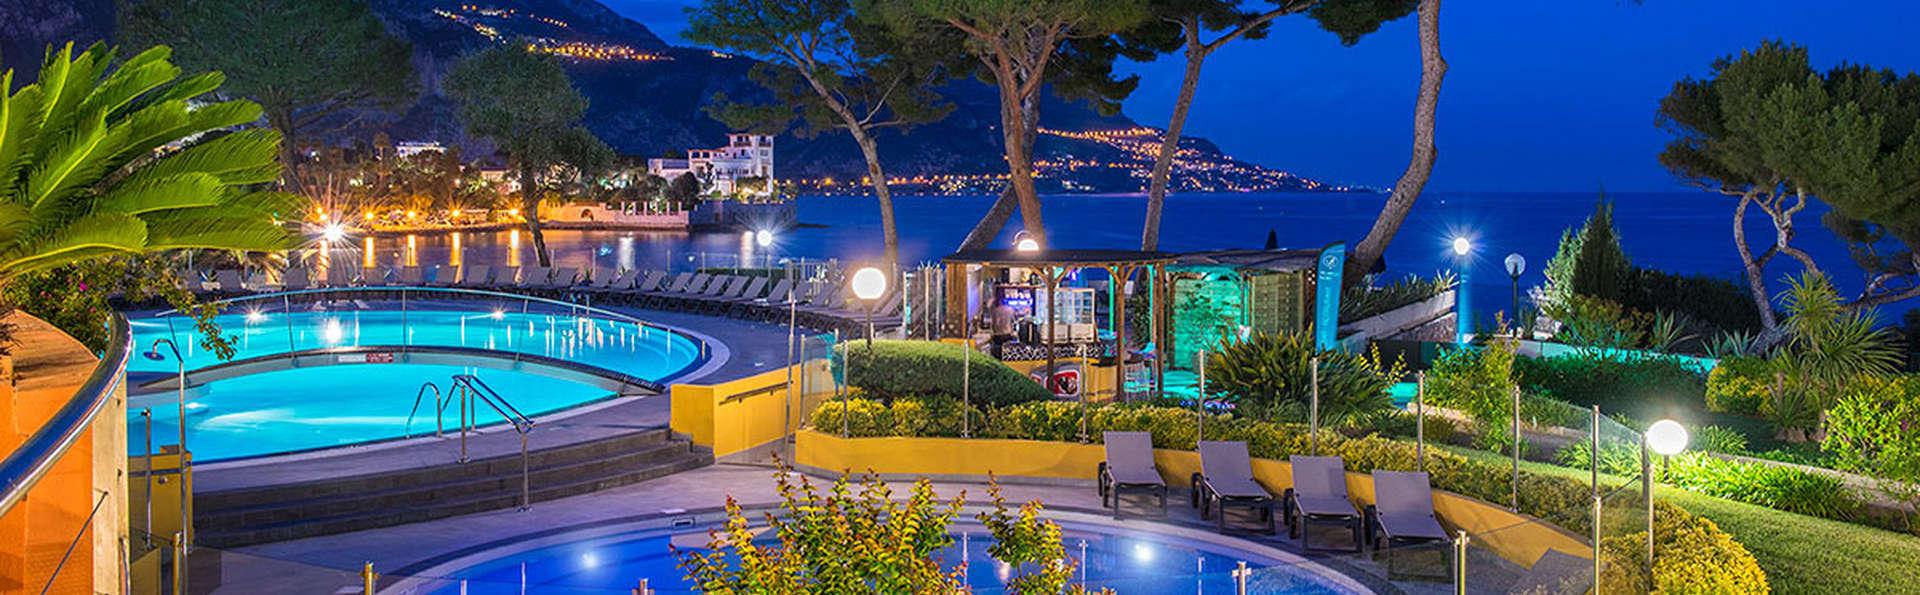 Hôtel Vacances Bleues Delcloy - Edit_Pool10.jpg